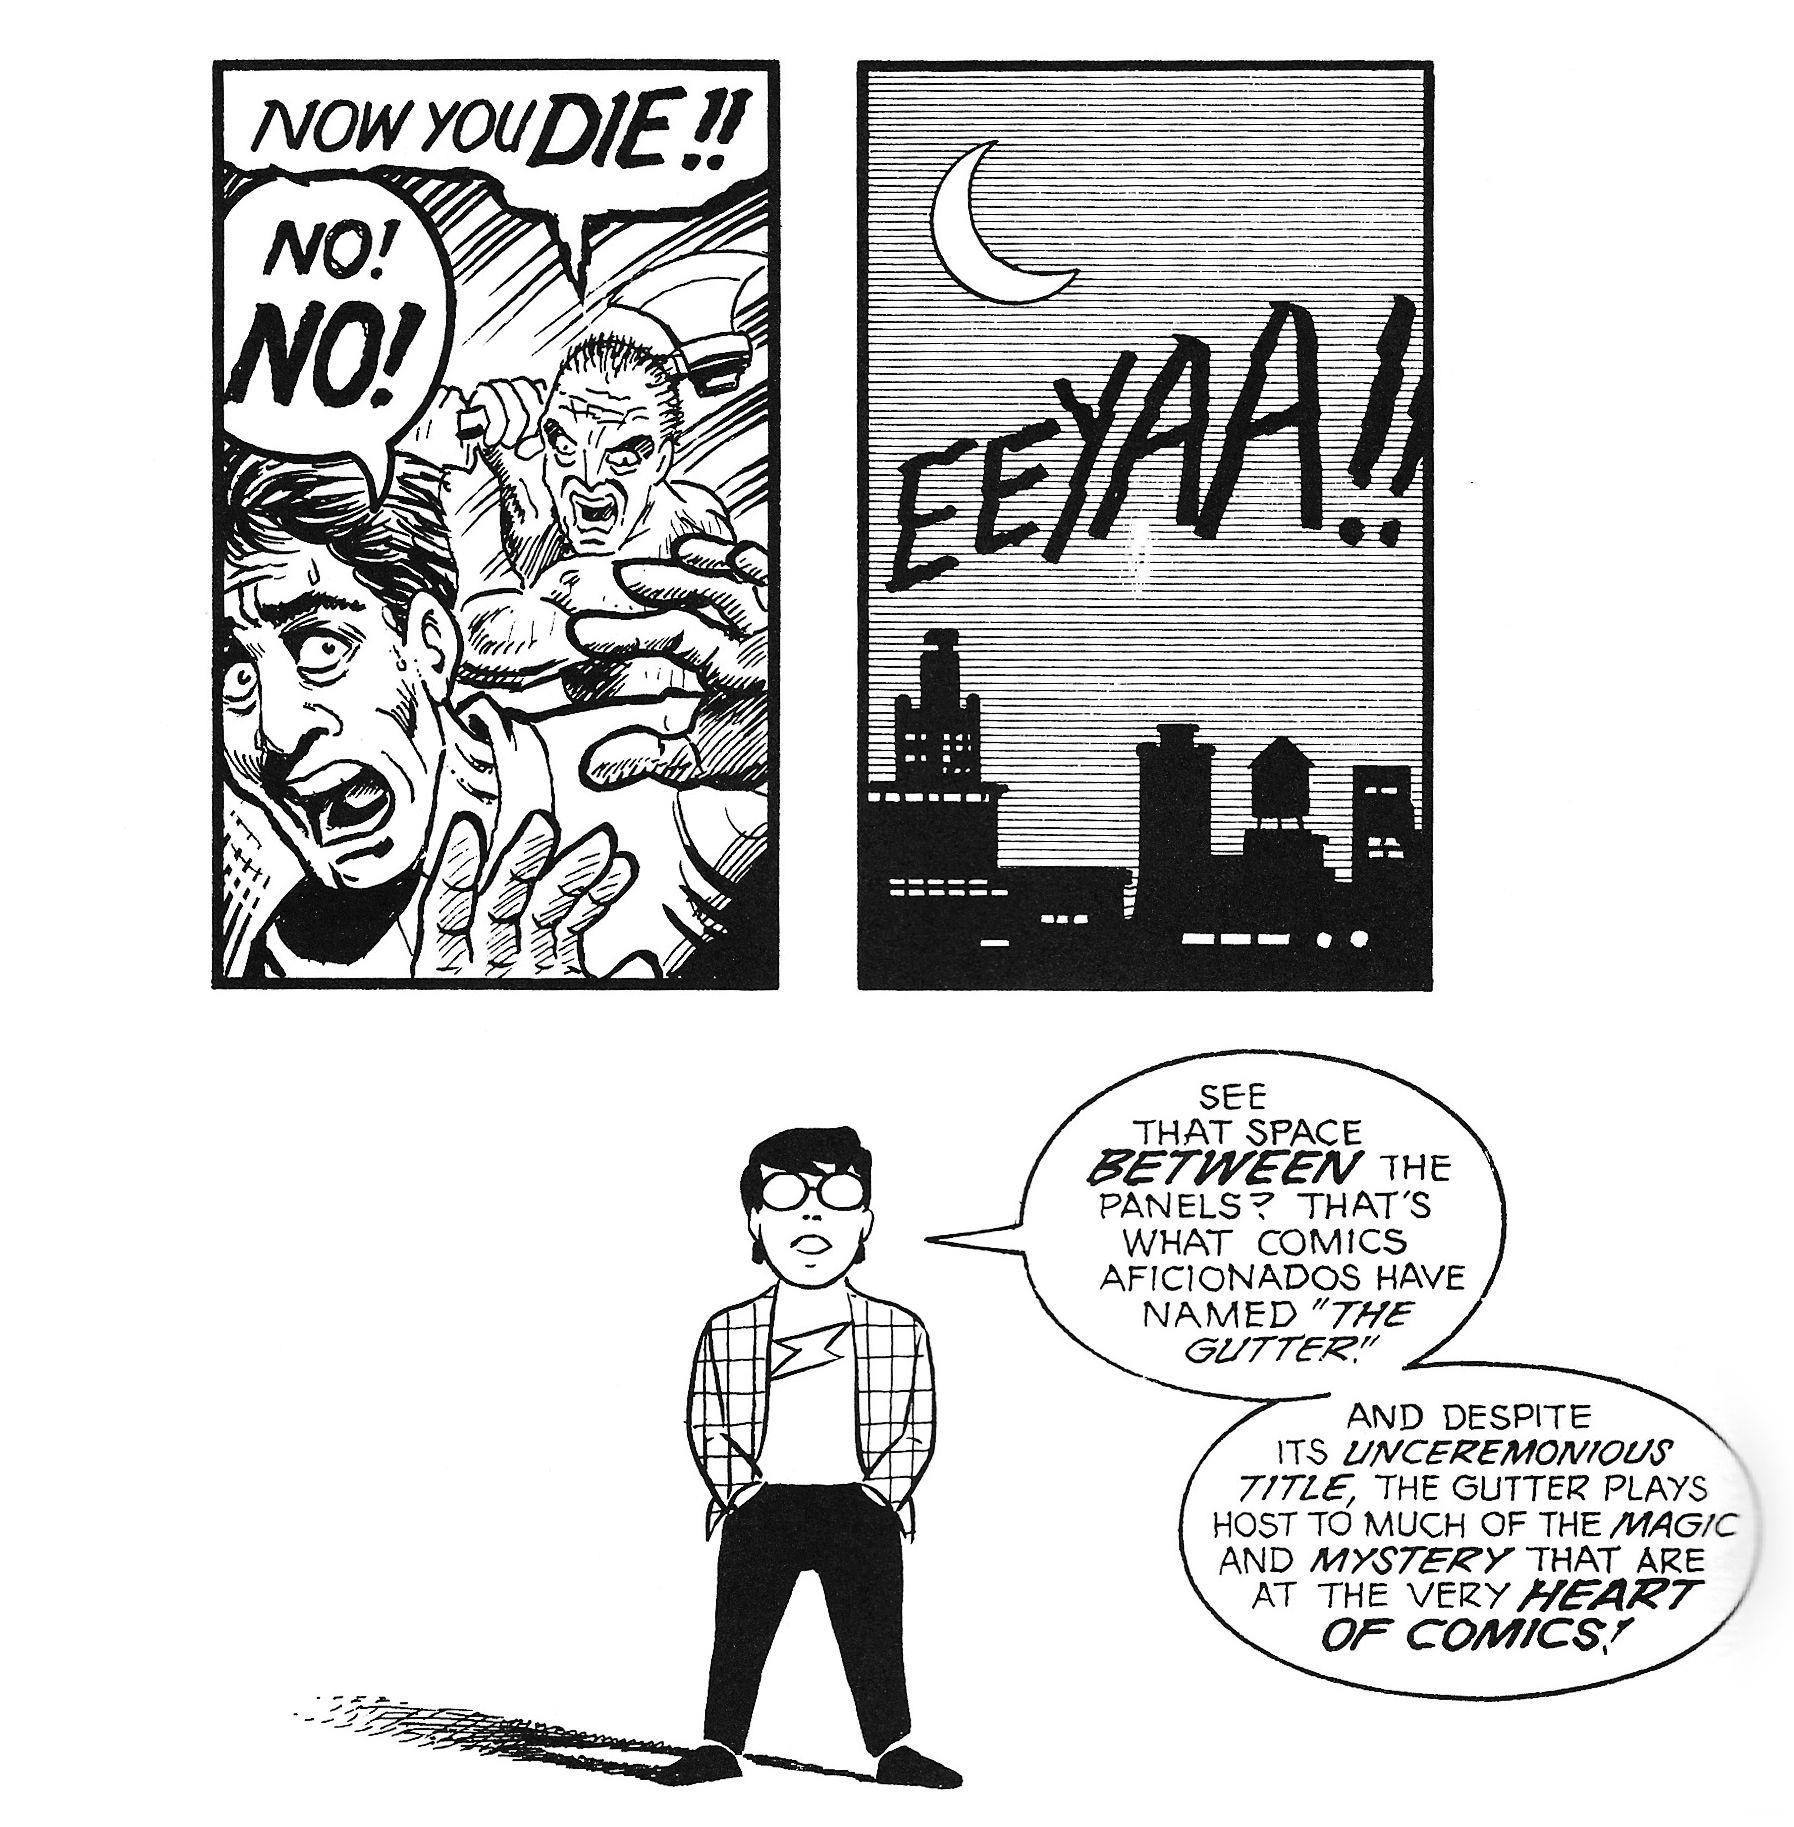 Scott McCloud - The Gutter | Comics, Mccloud, Storyboard